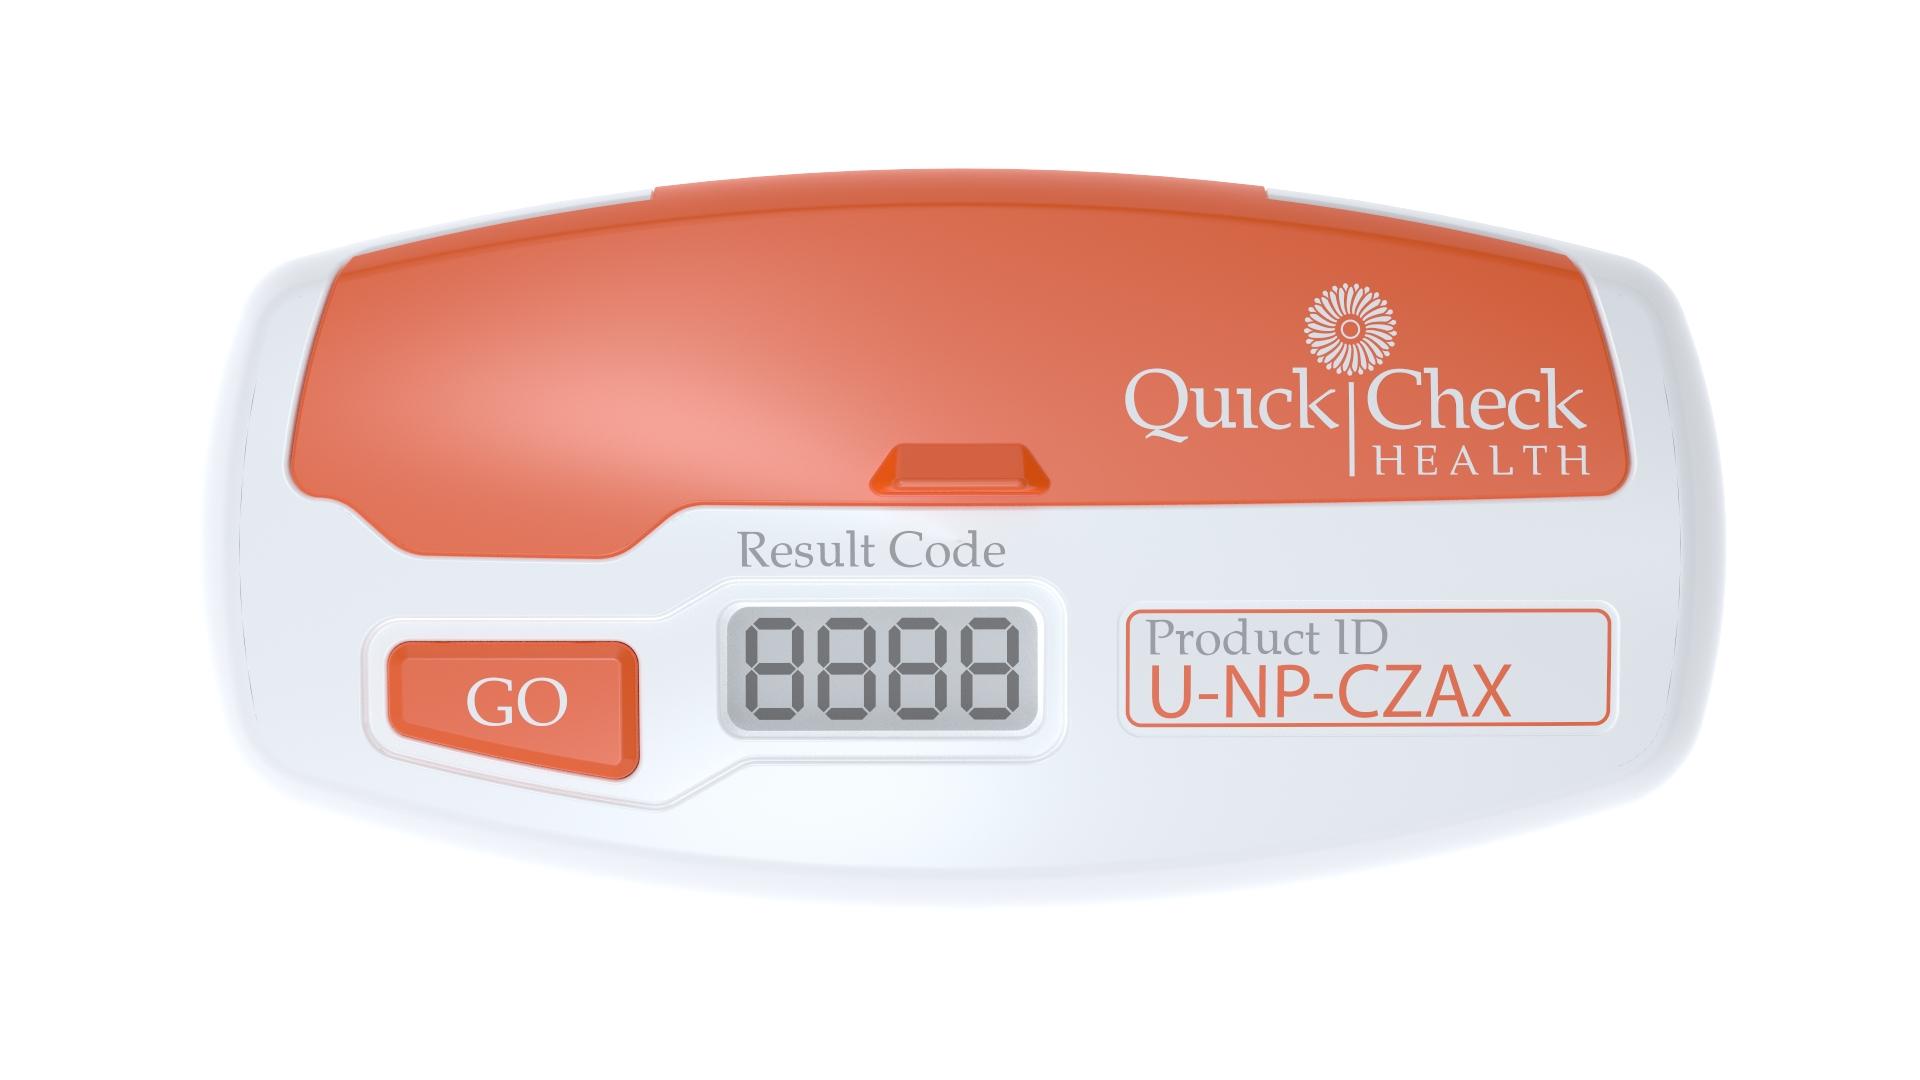 qc device front orange.jpg